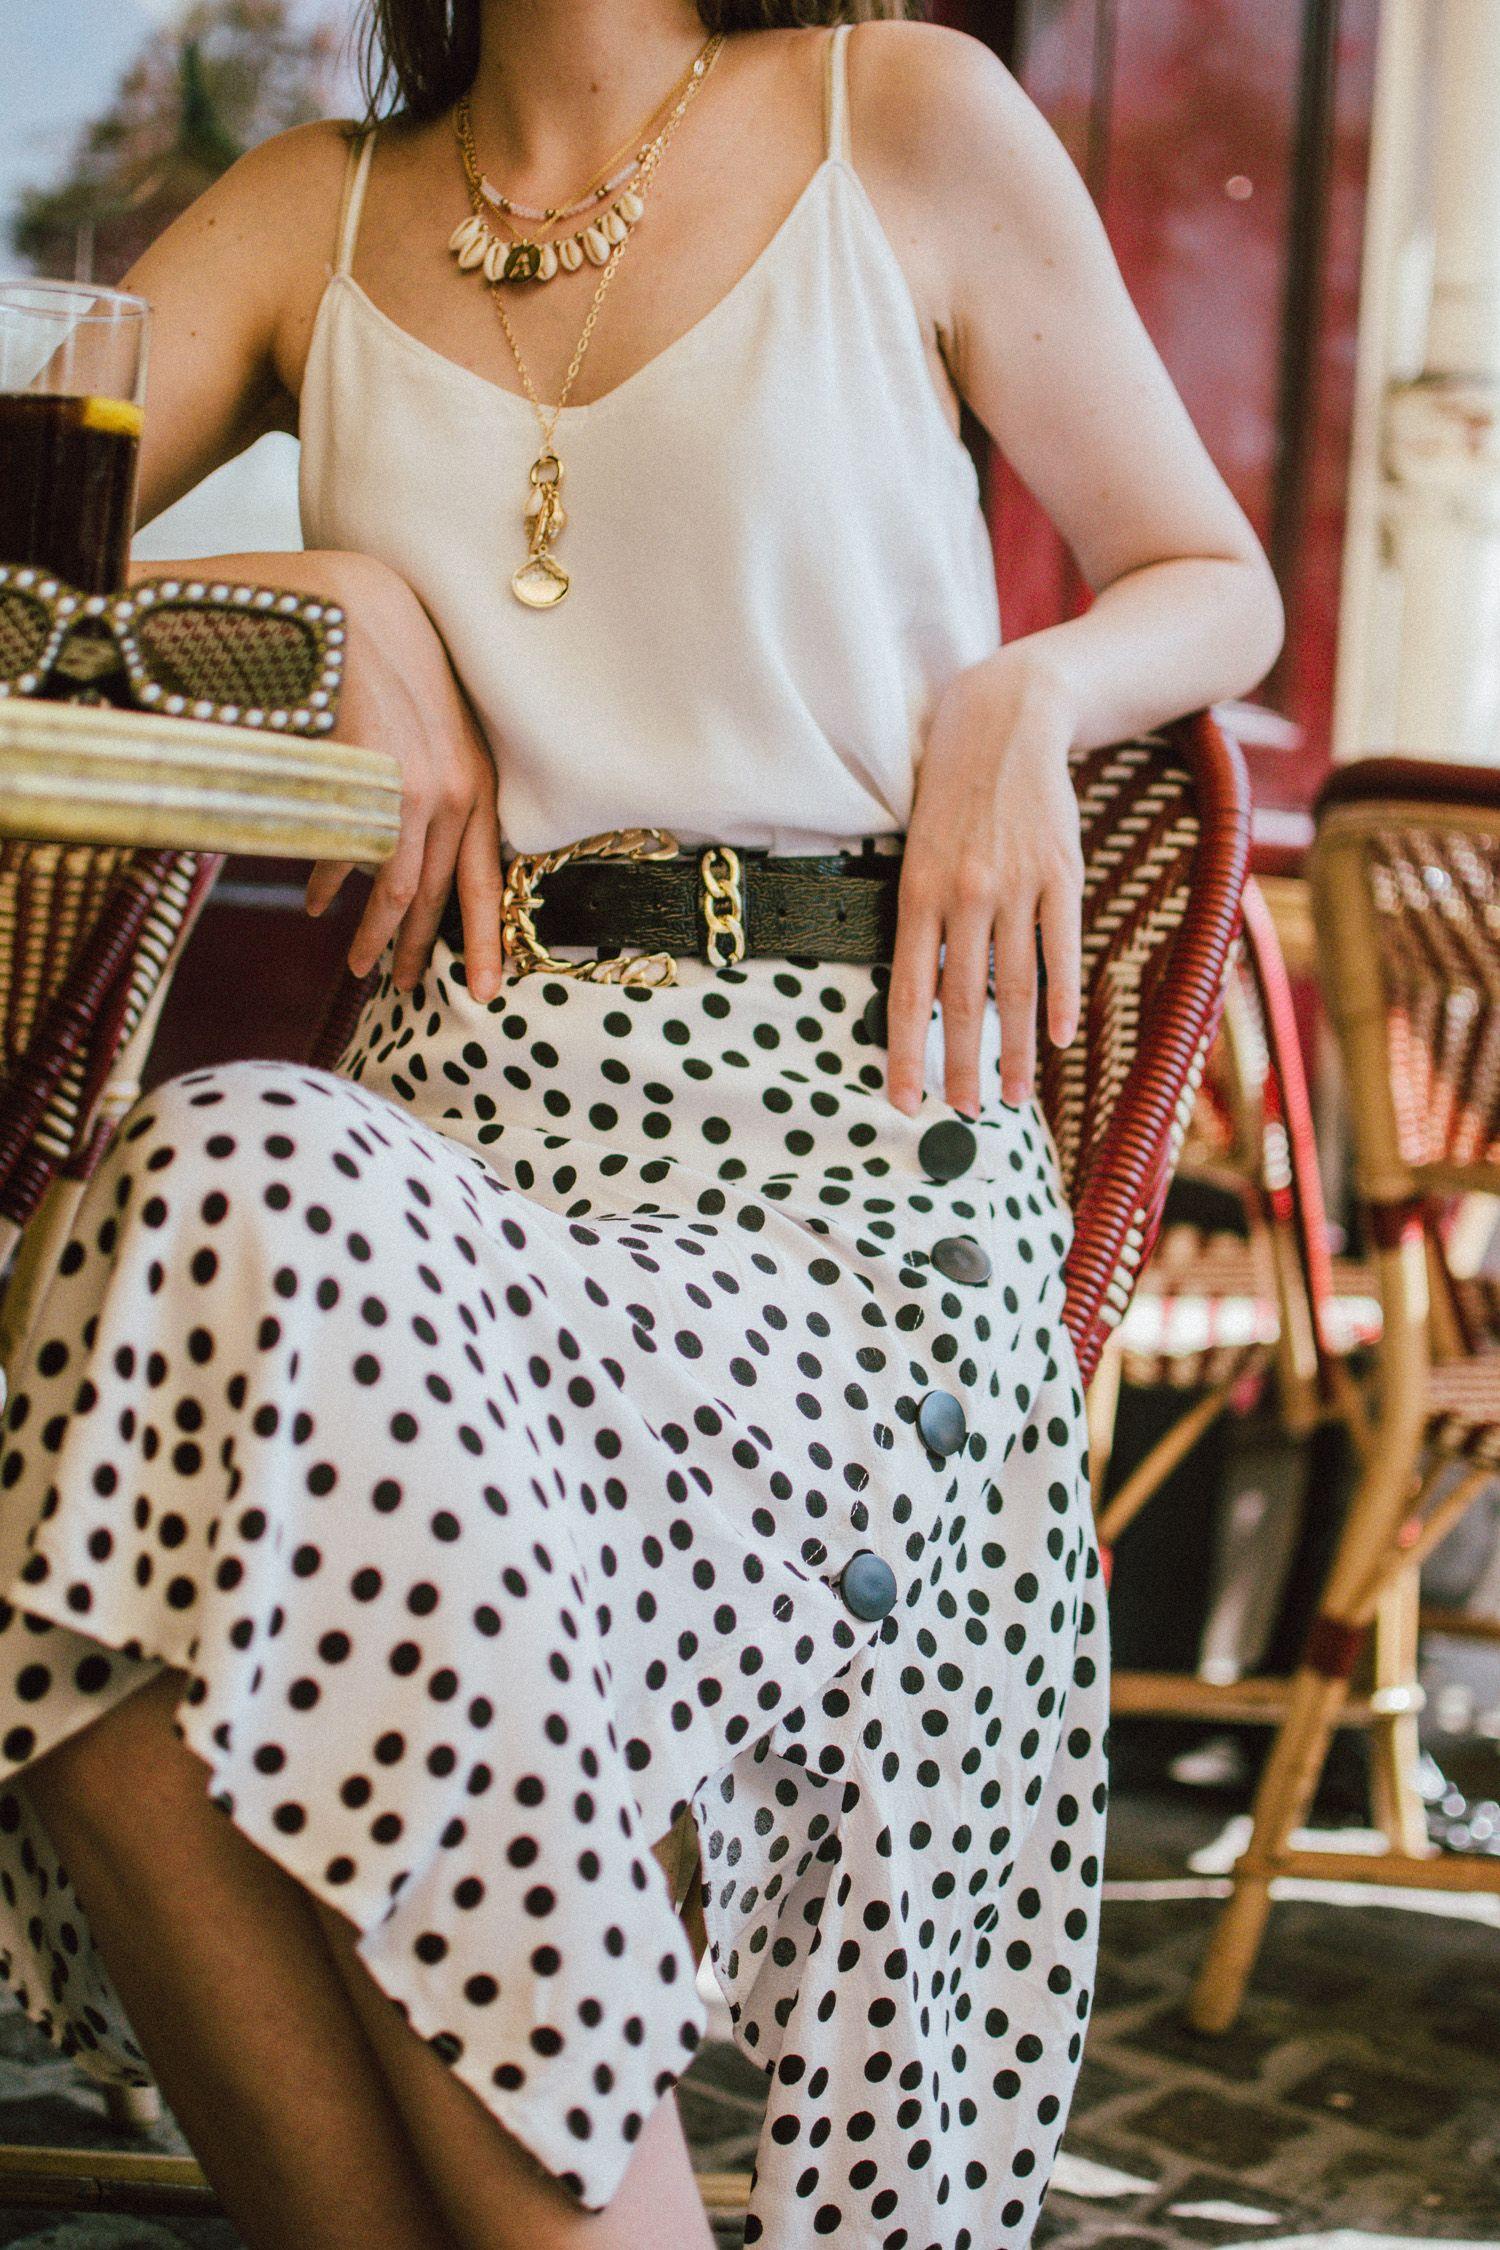 dee286f0e9e7 The easy breezy way to wear a polka dot skirt